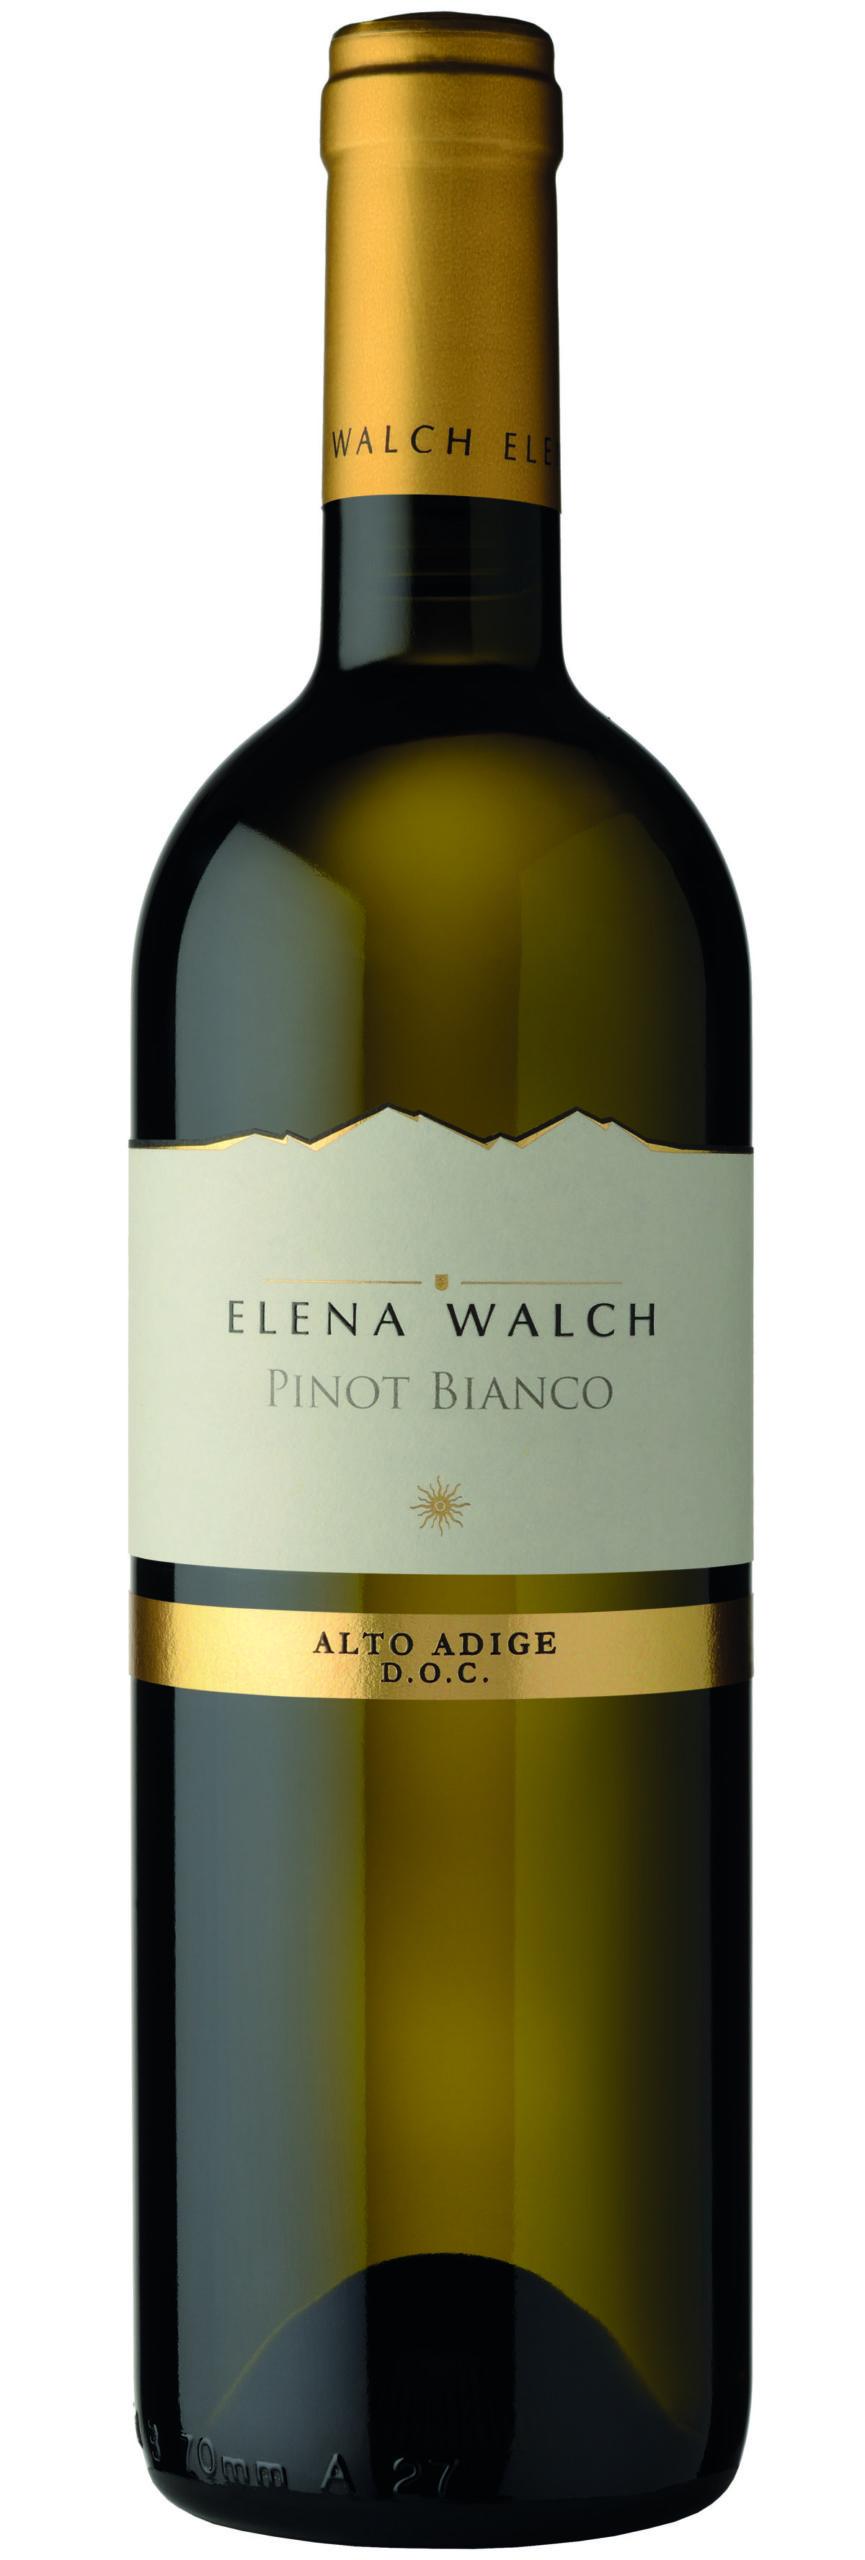 Pinot Bianco 【NEW】ピノ・ビアンコ